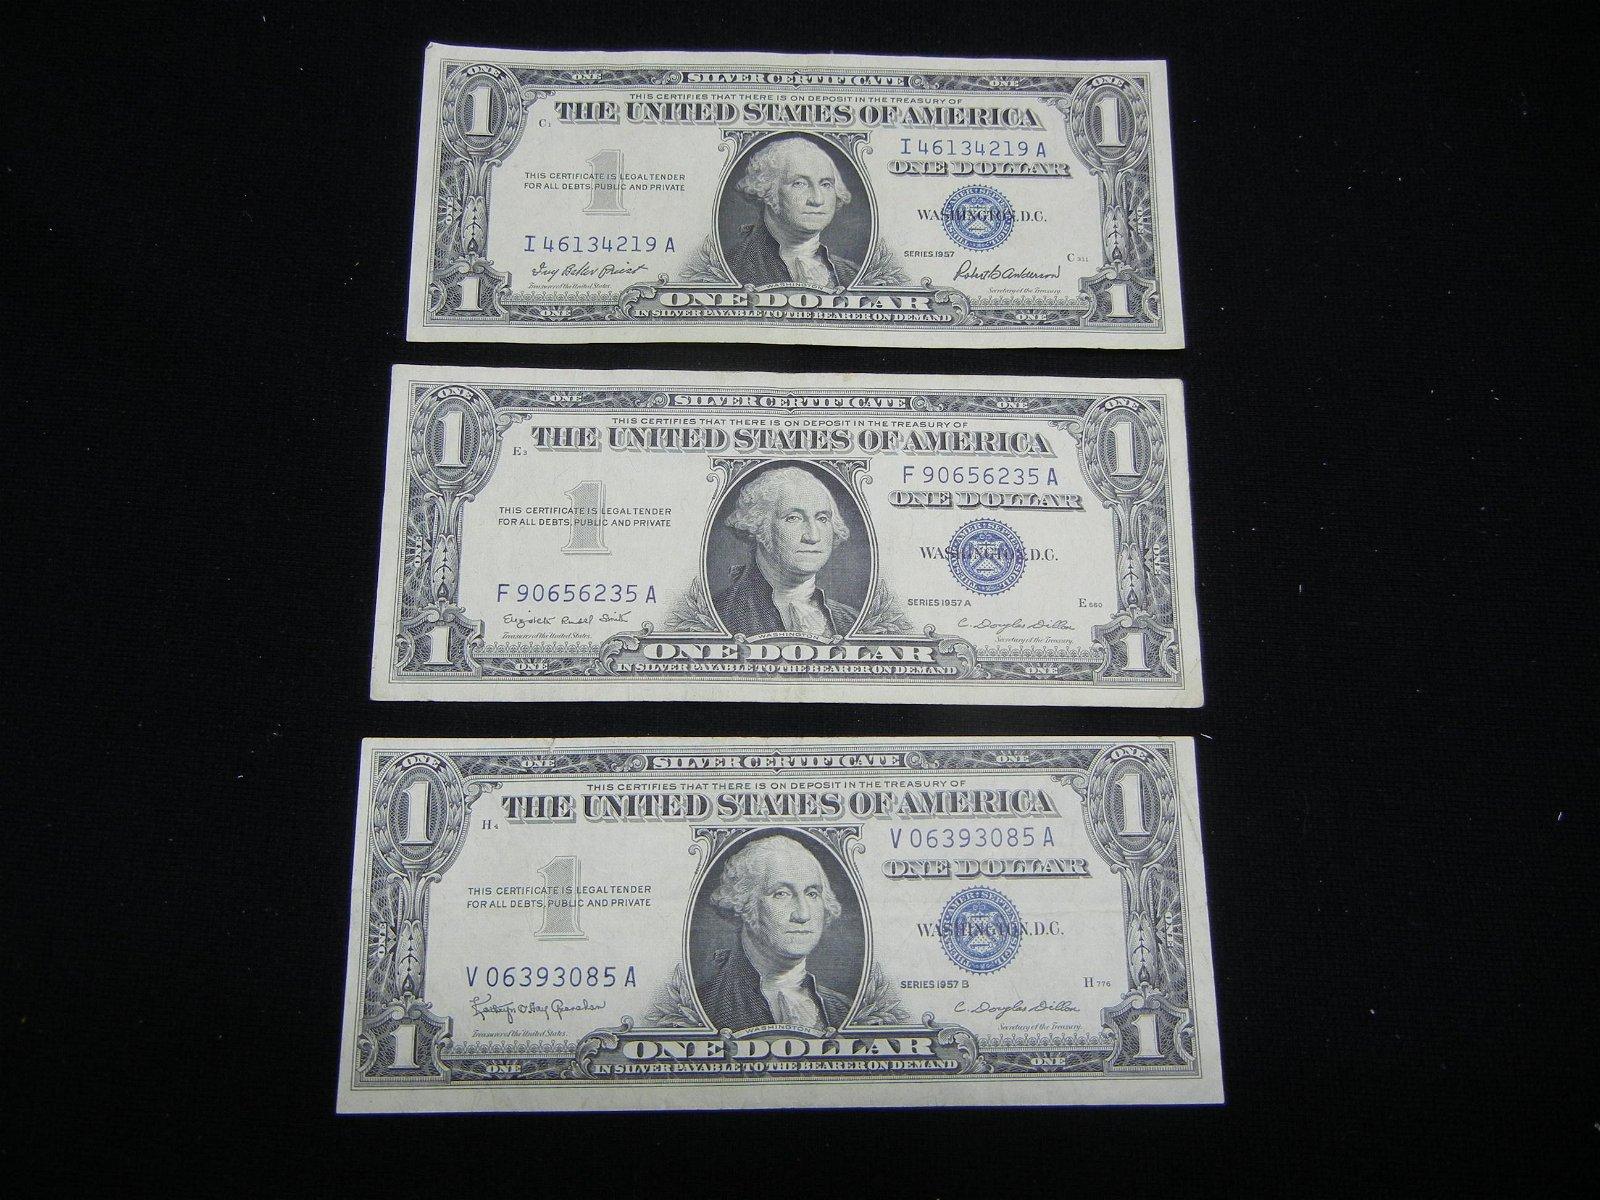 1957, 1957-A, 1957-B One Dollar Silver Certificates